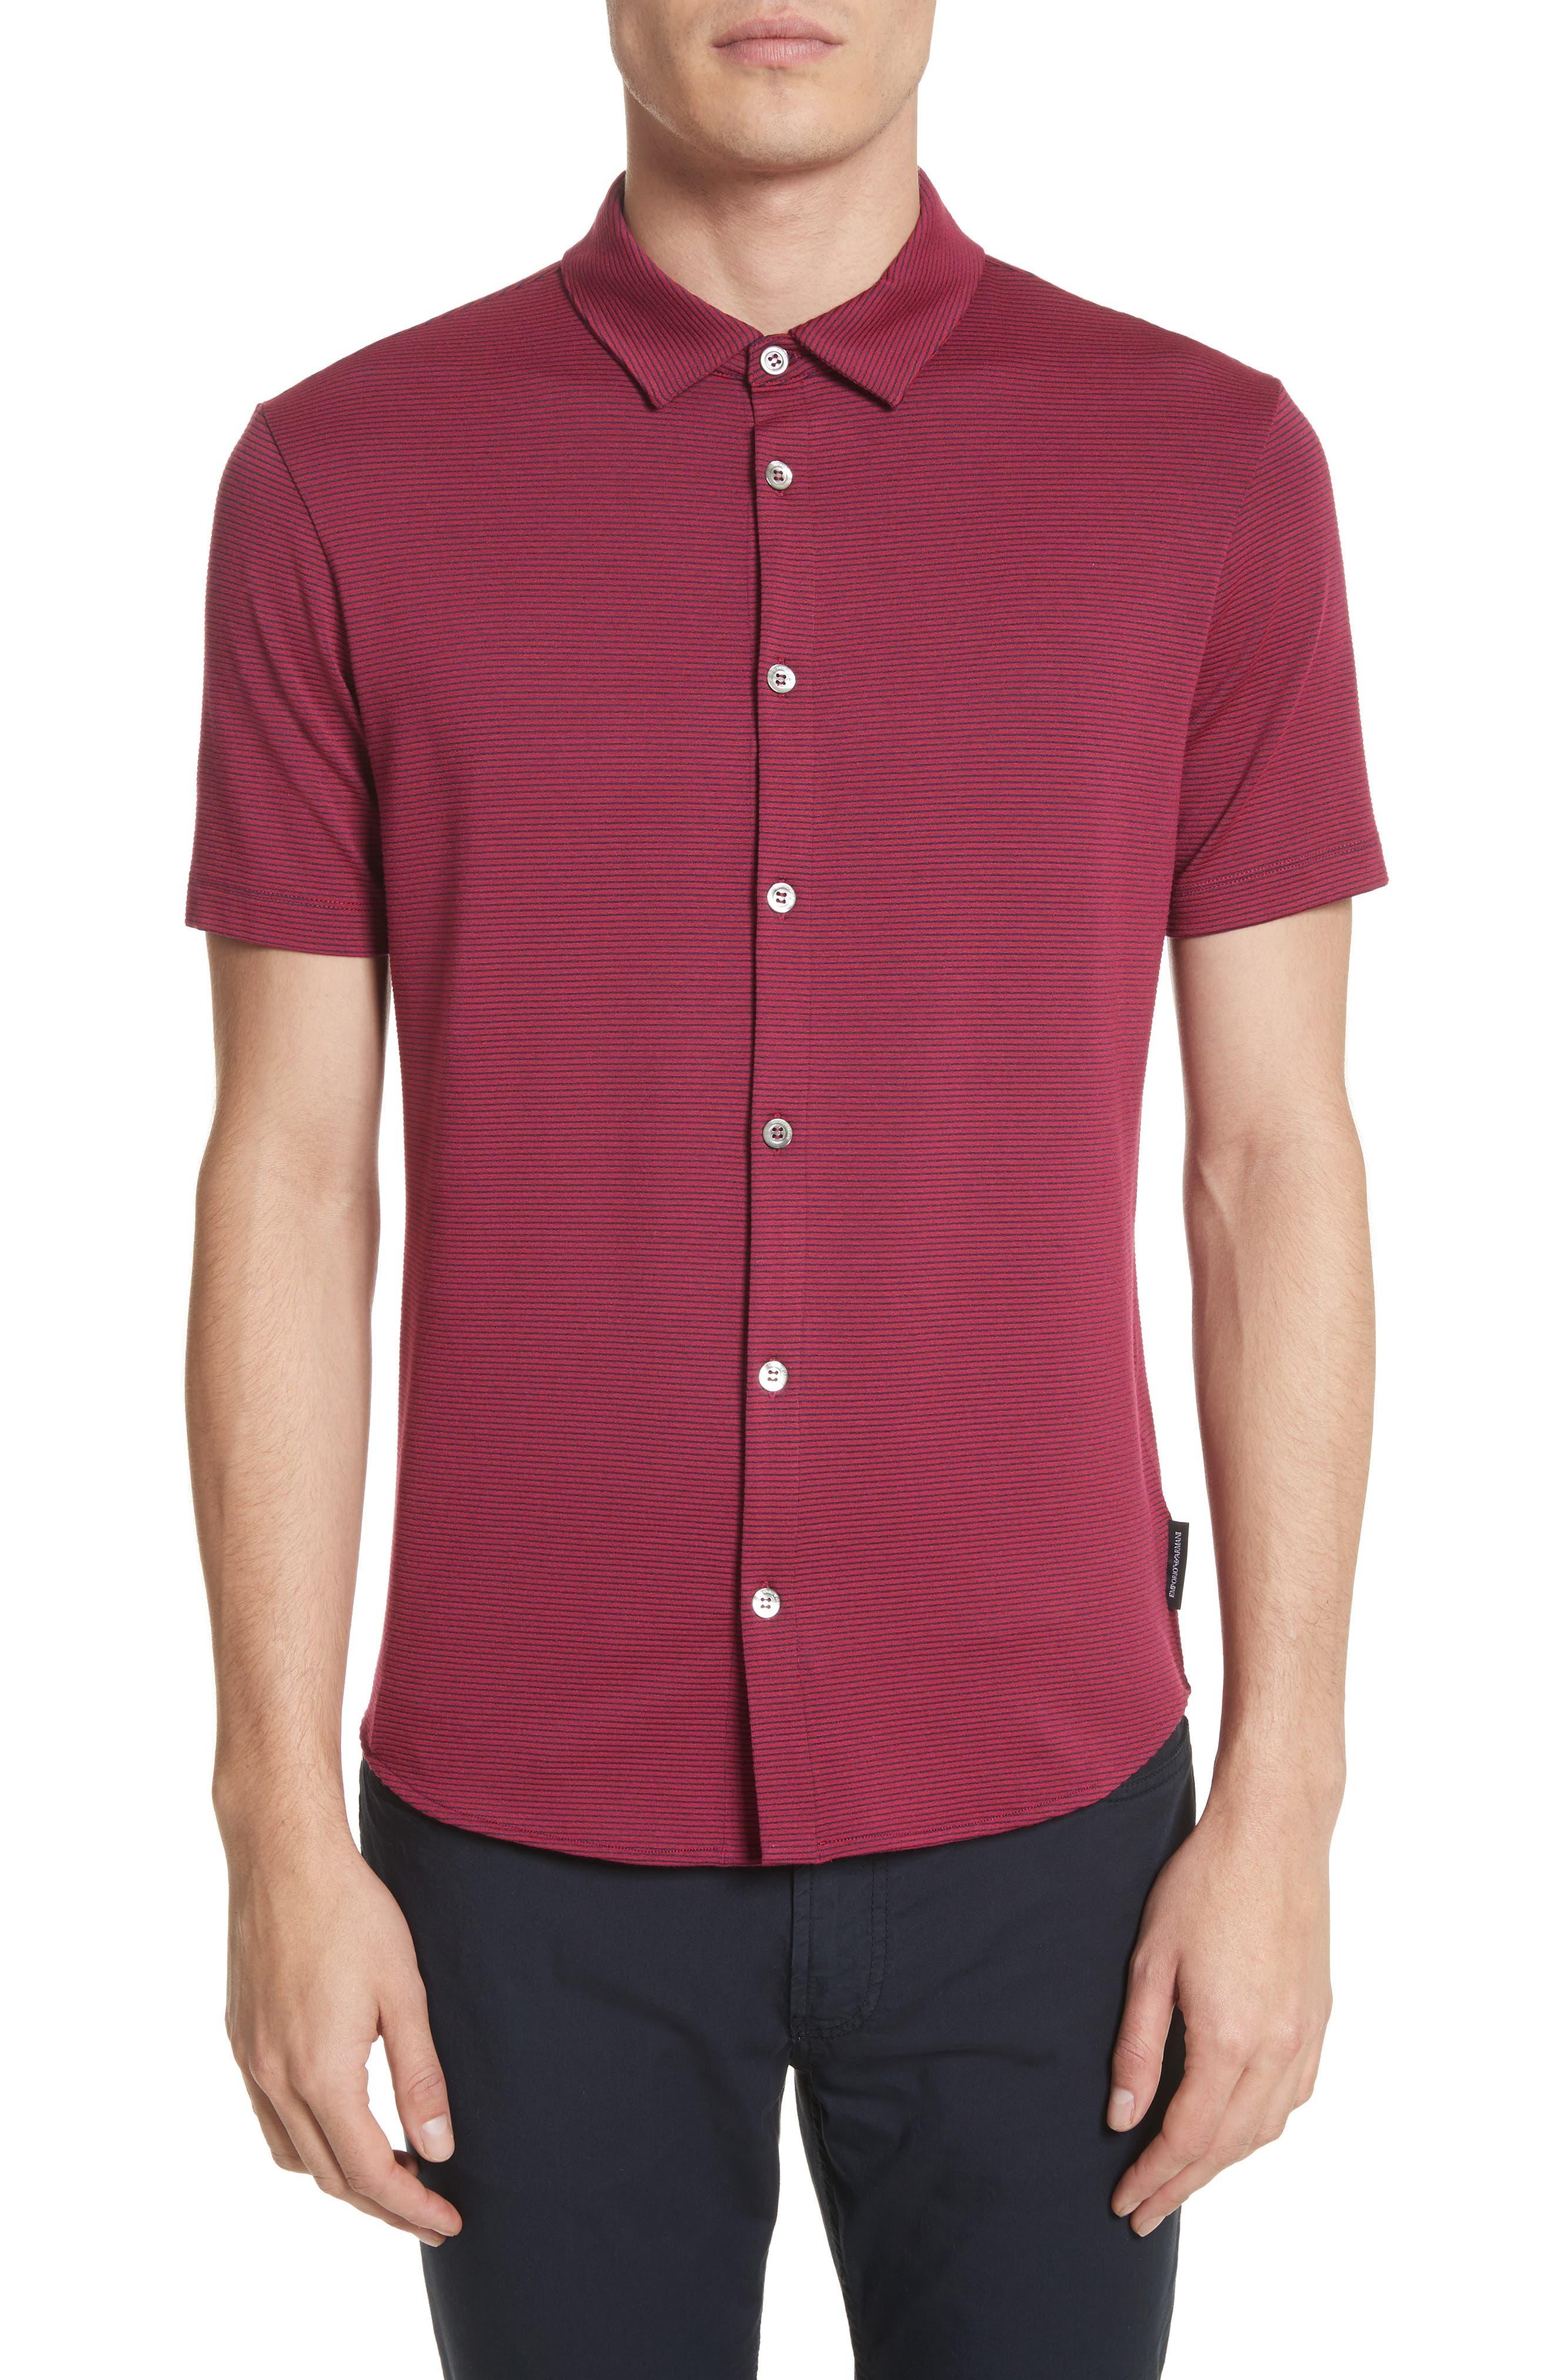 Main Image - Emporio Armani Slim Fit Knit Shirt